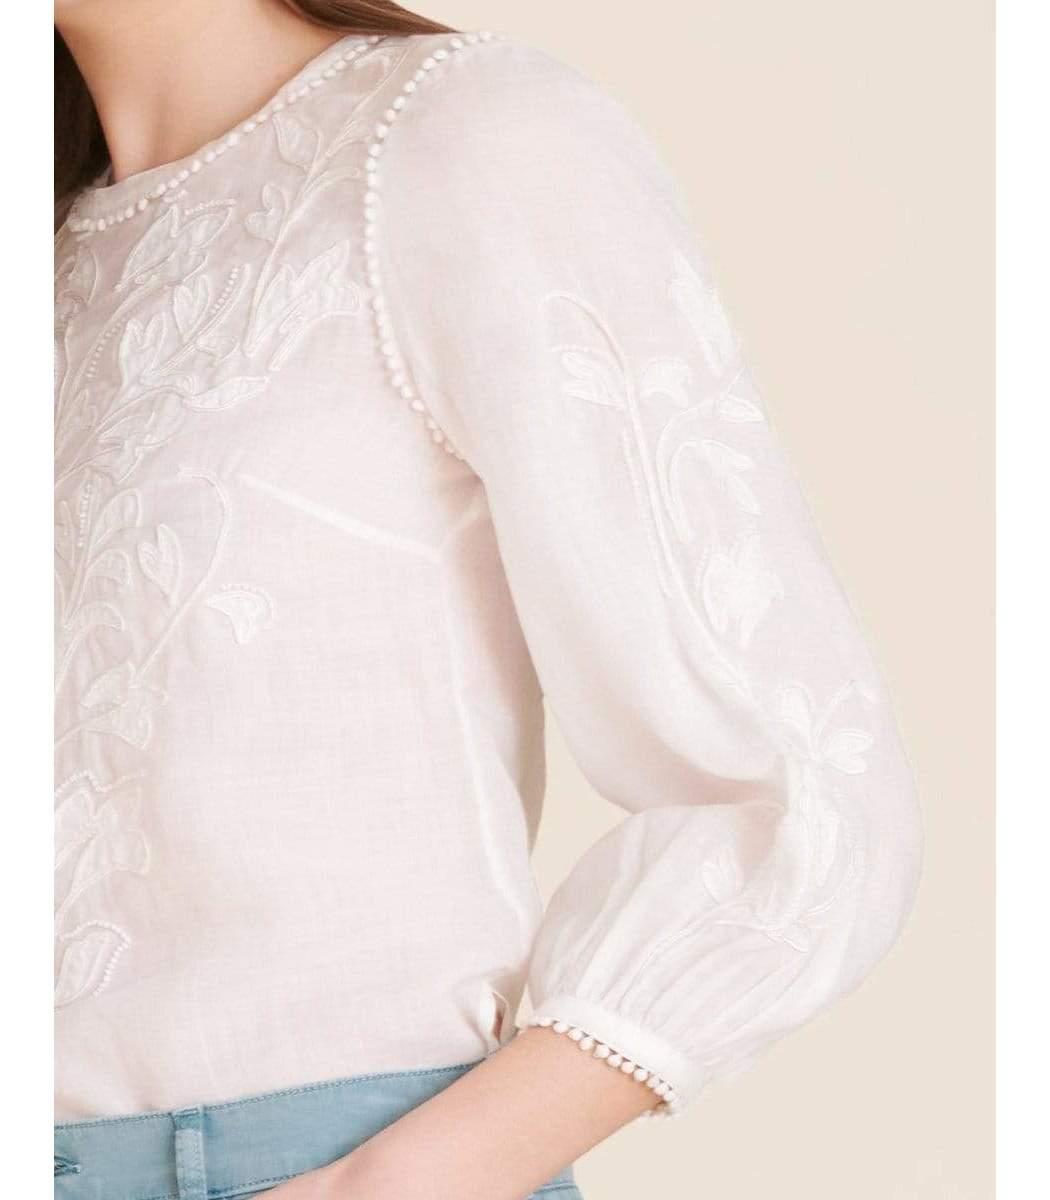 VERONICA BEARD Tops White Maryana Embroidered Top